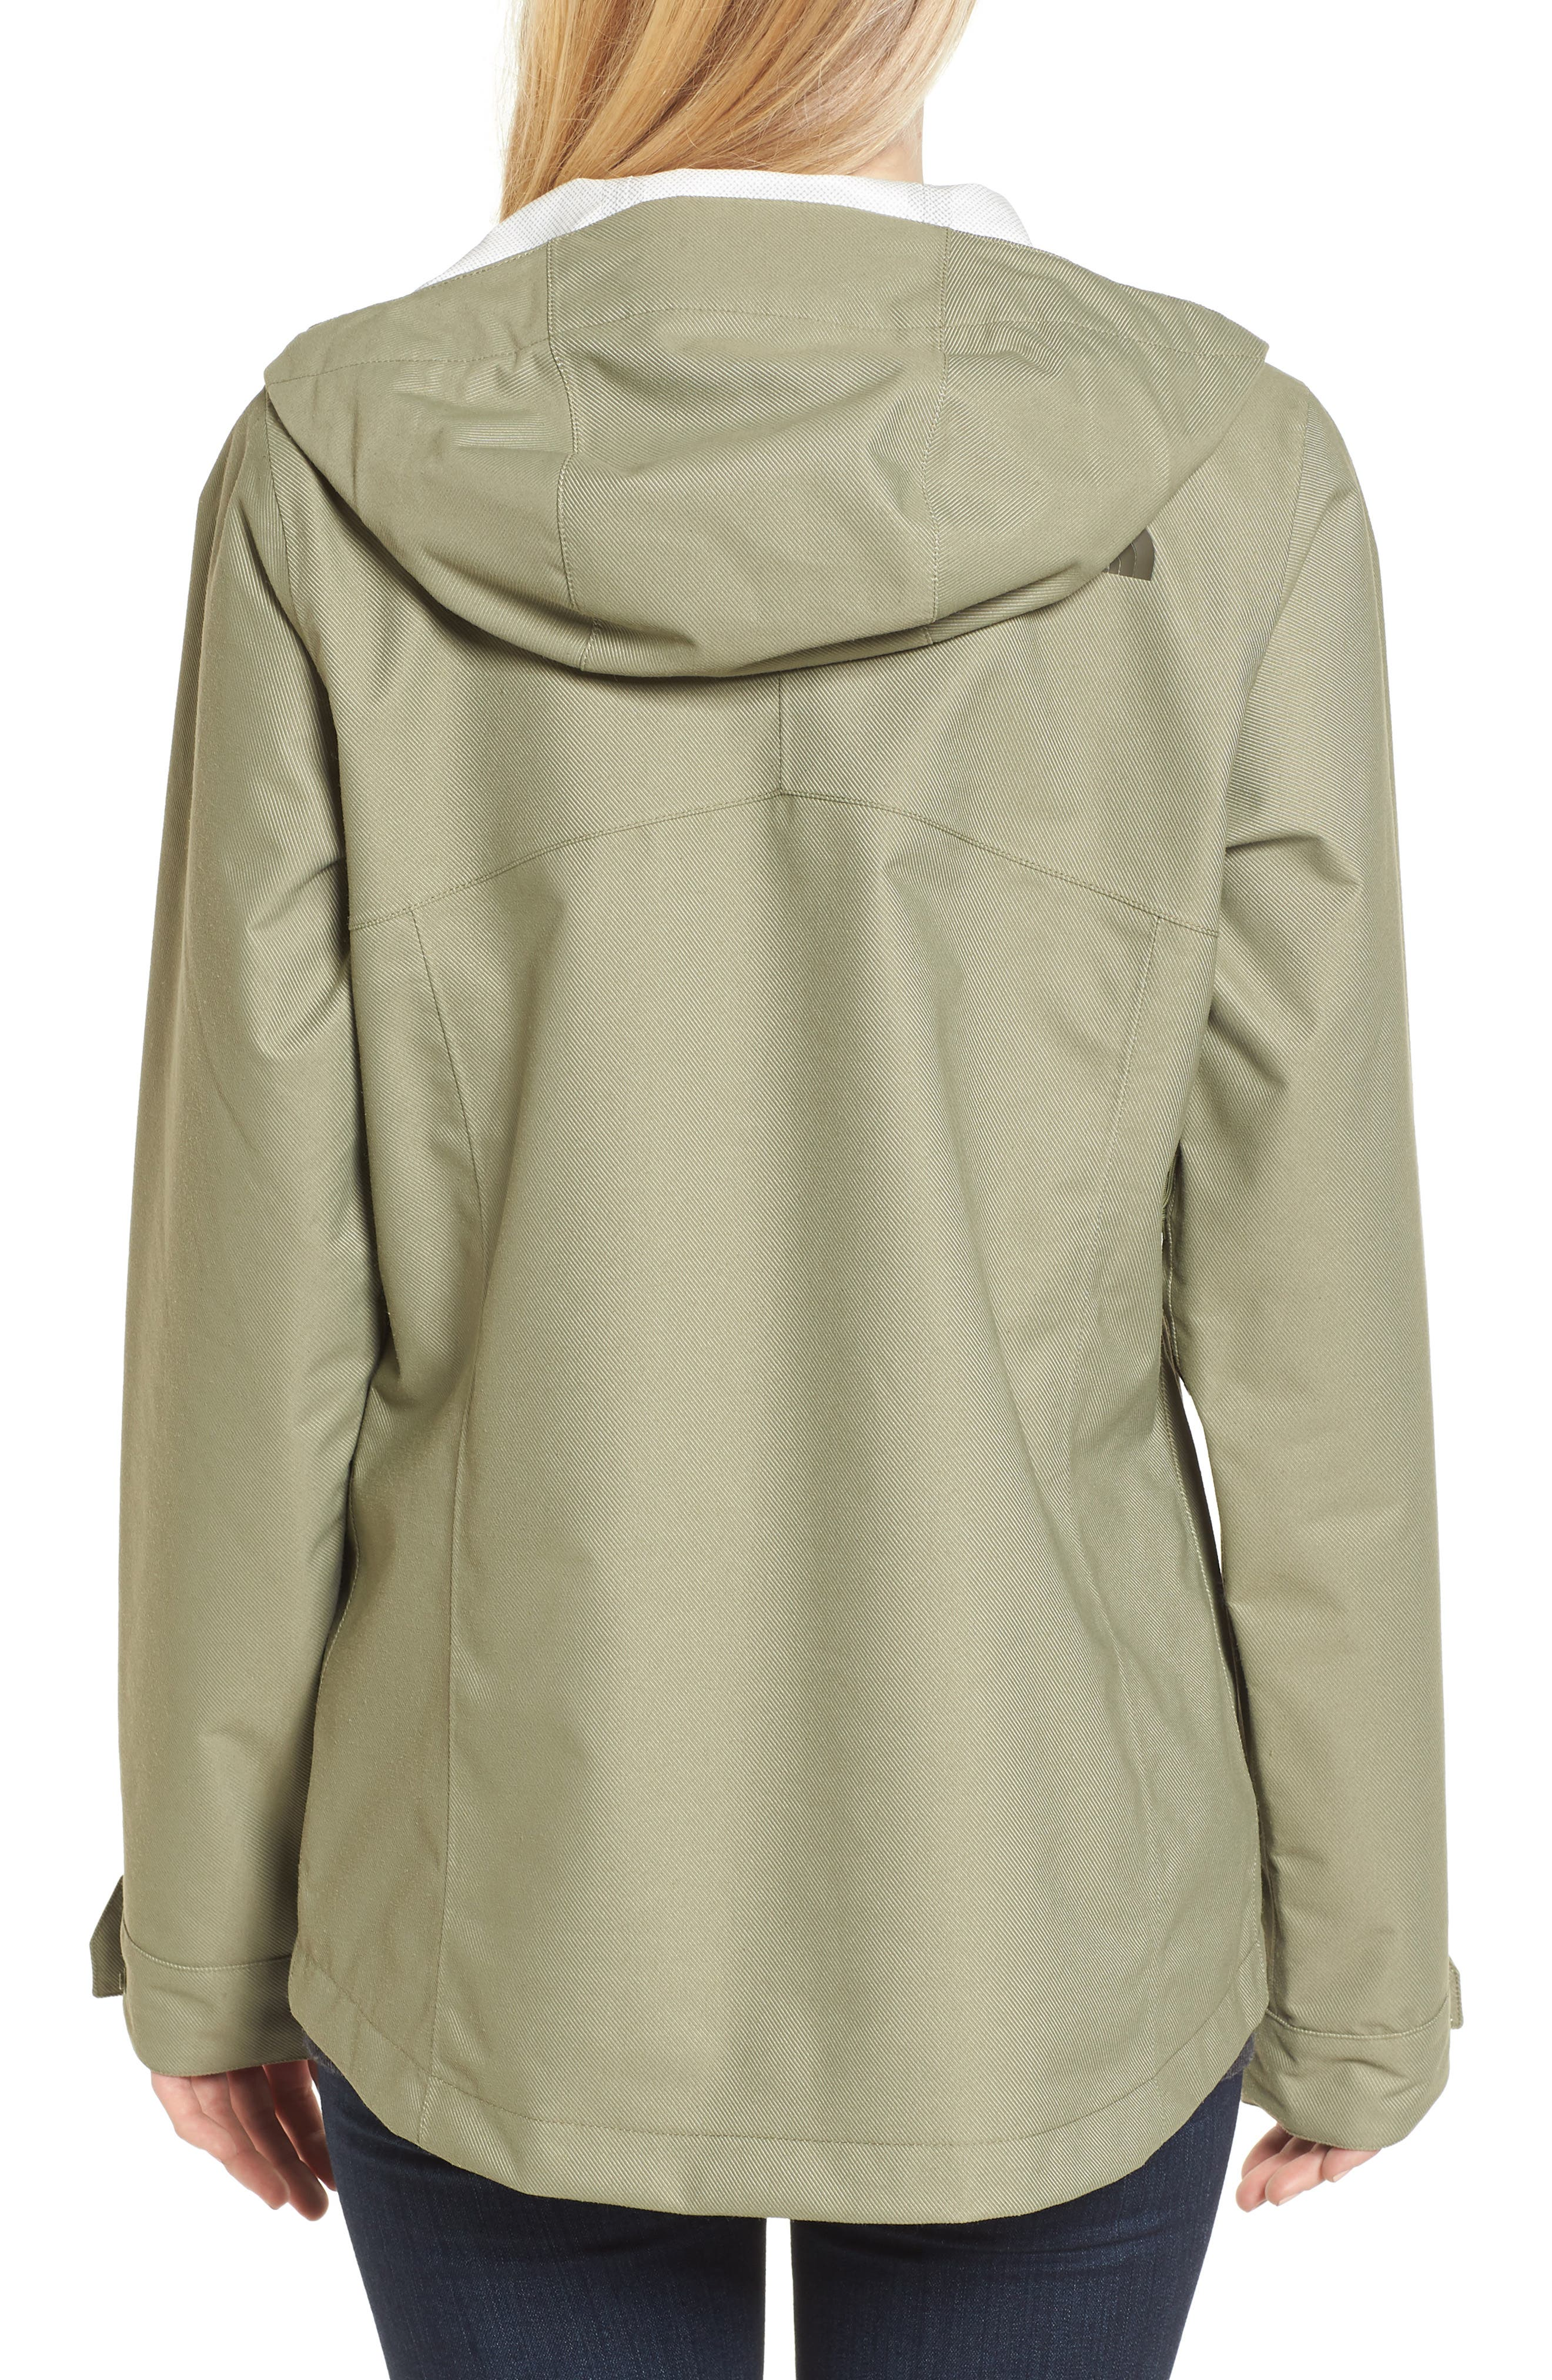 Berrien Waterproof Jacket,                             Alternate thumbnail 2, color,                             Deep Lichen Green Denim